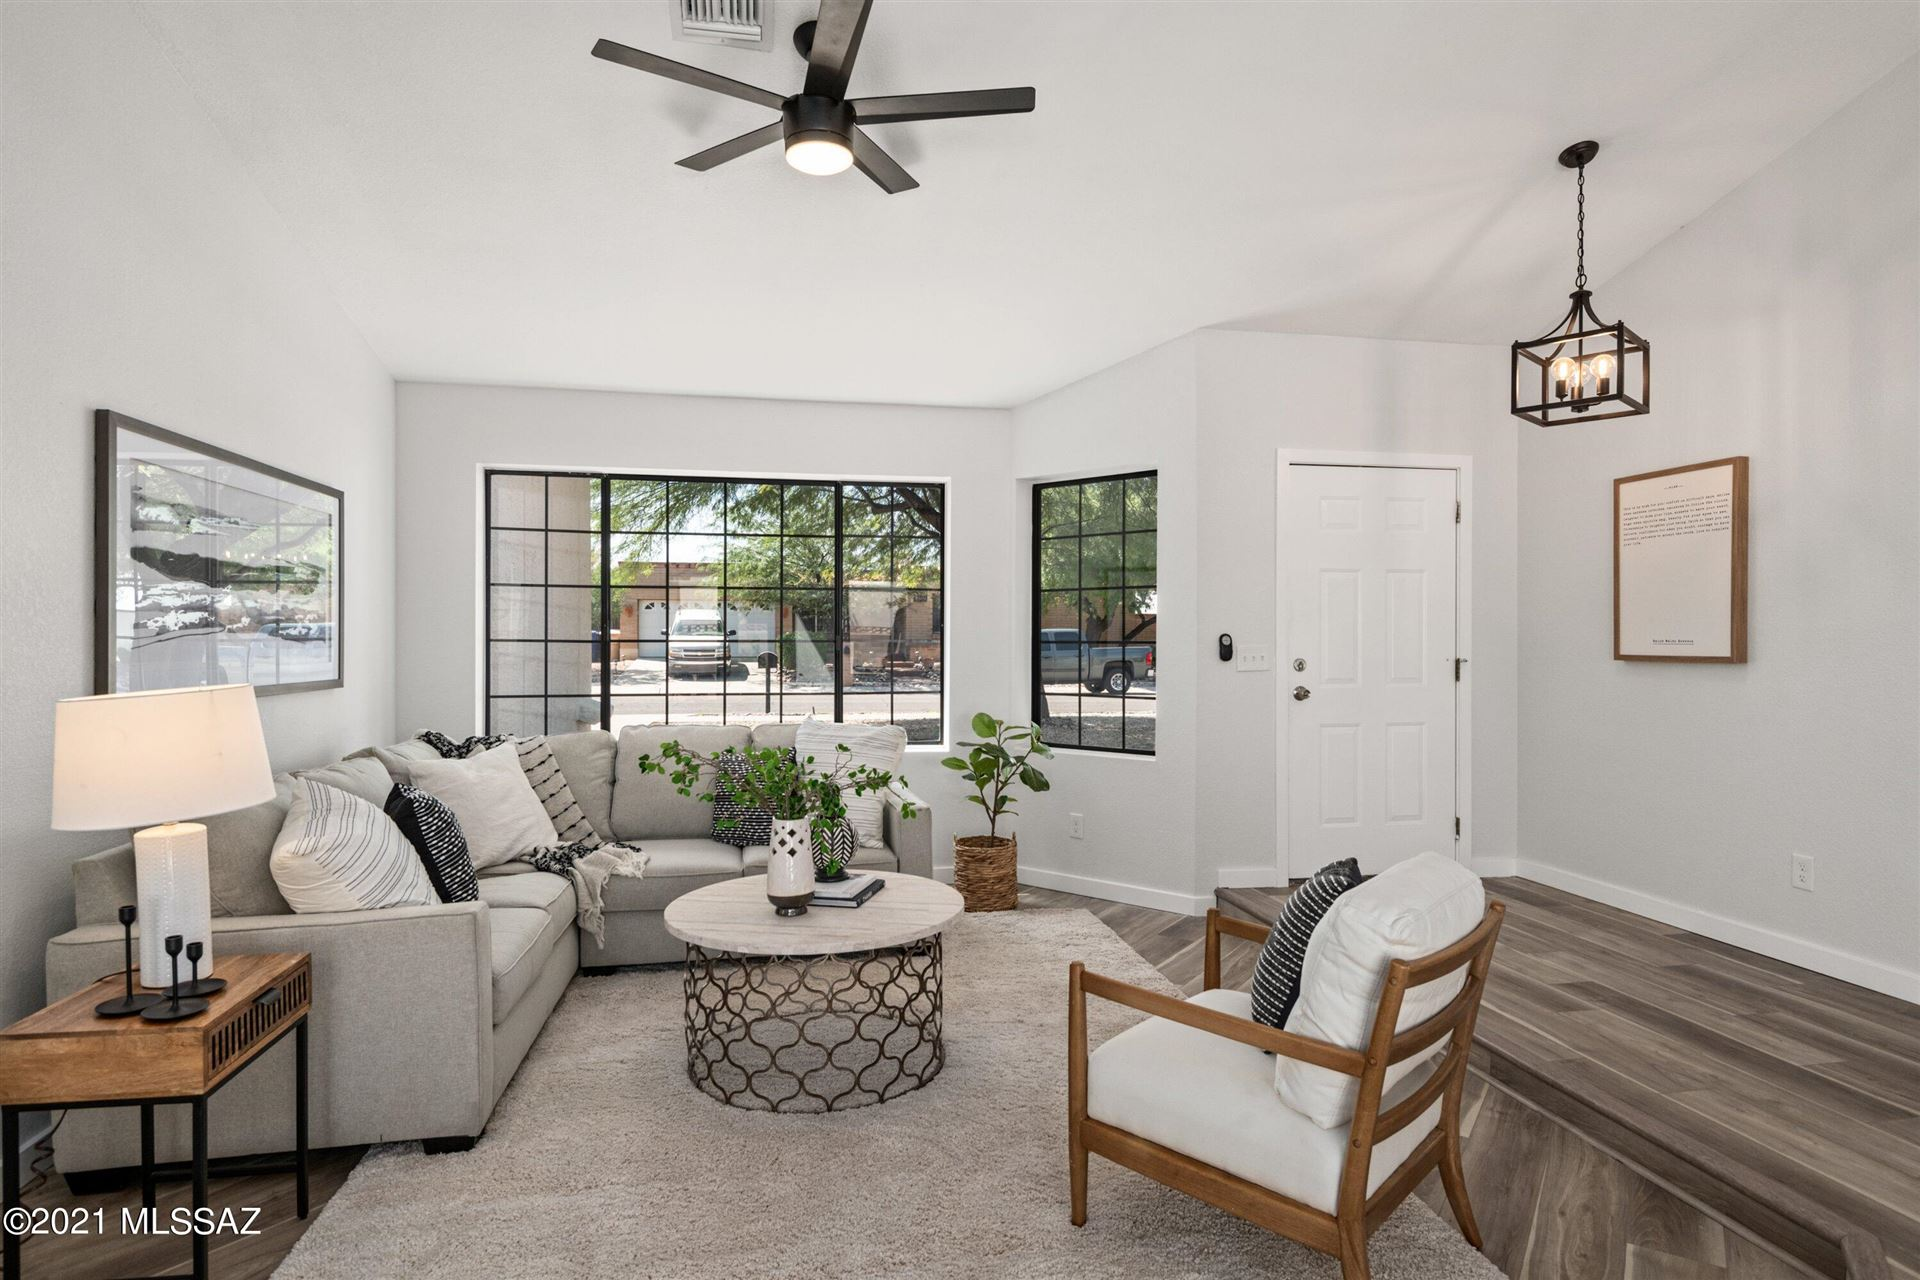 9457 E 3Rd Street, Tucson, AZ 85710 - MLS#: 22122608